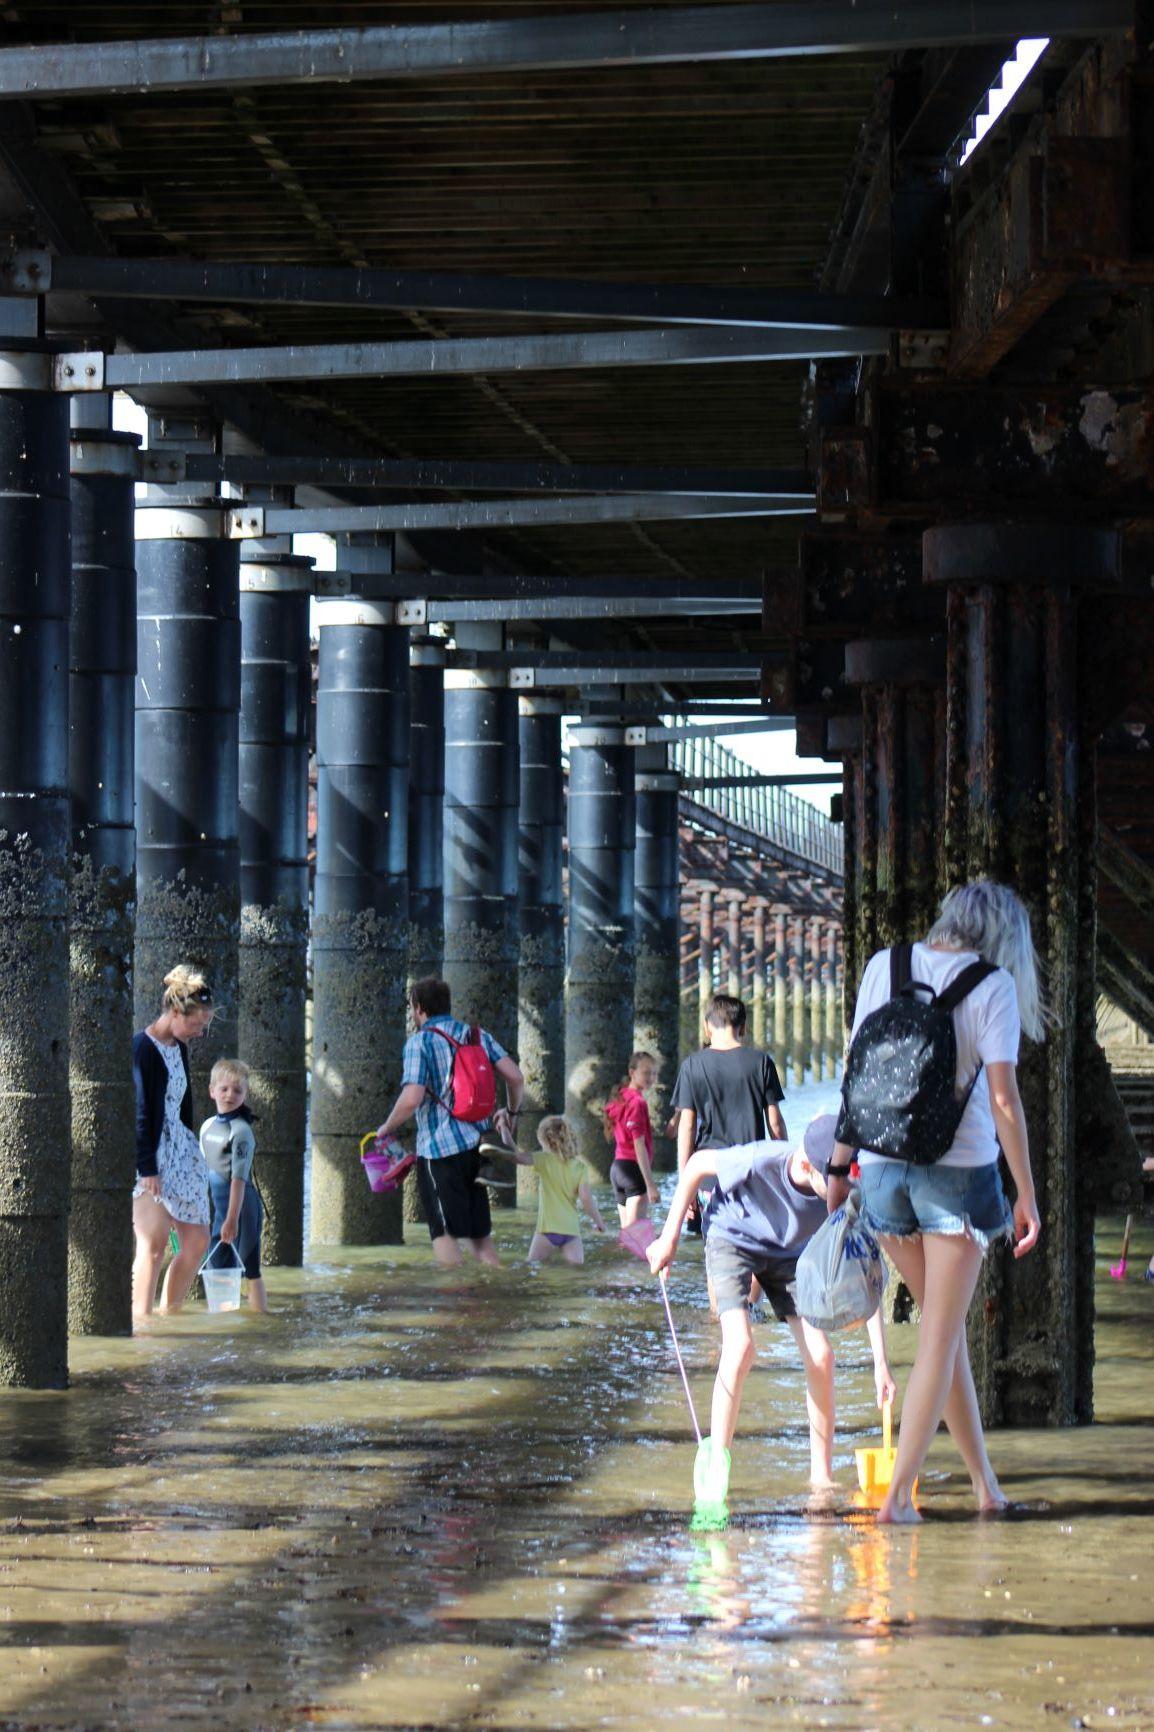 Under the Pier in a Biosphere